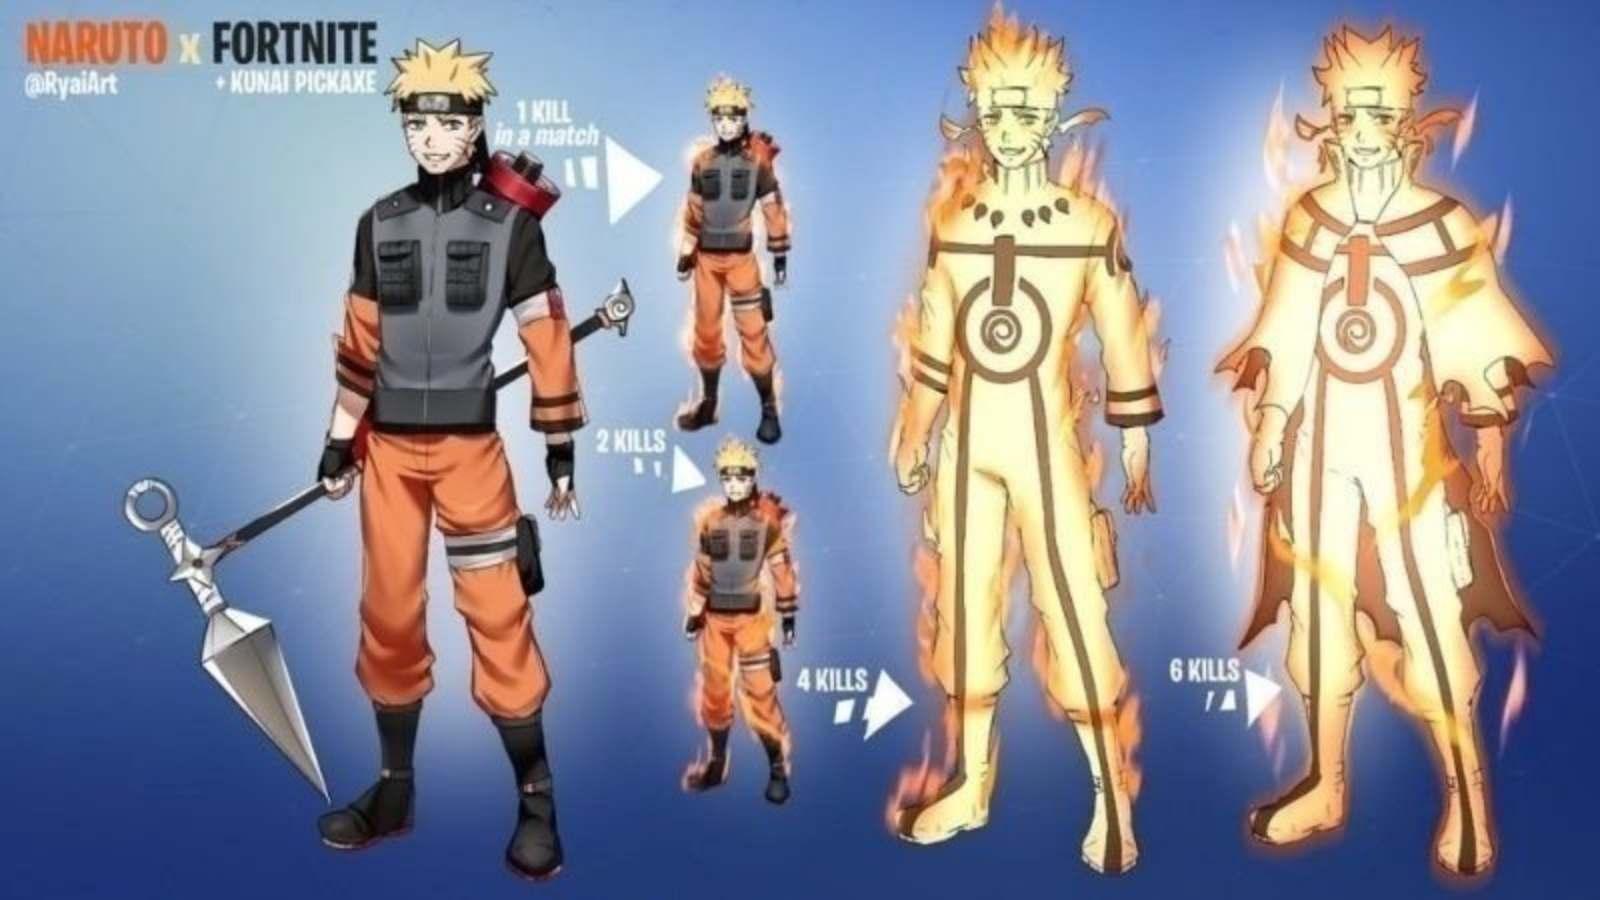 Fortnite Naruto Skin: Neues Skin-Release-Datum in Staffel 8